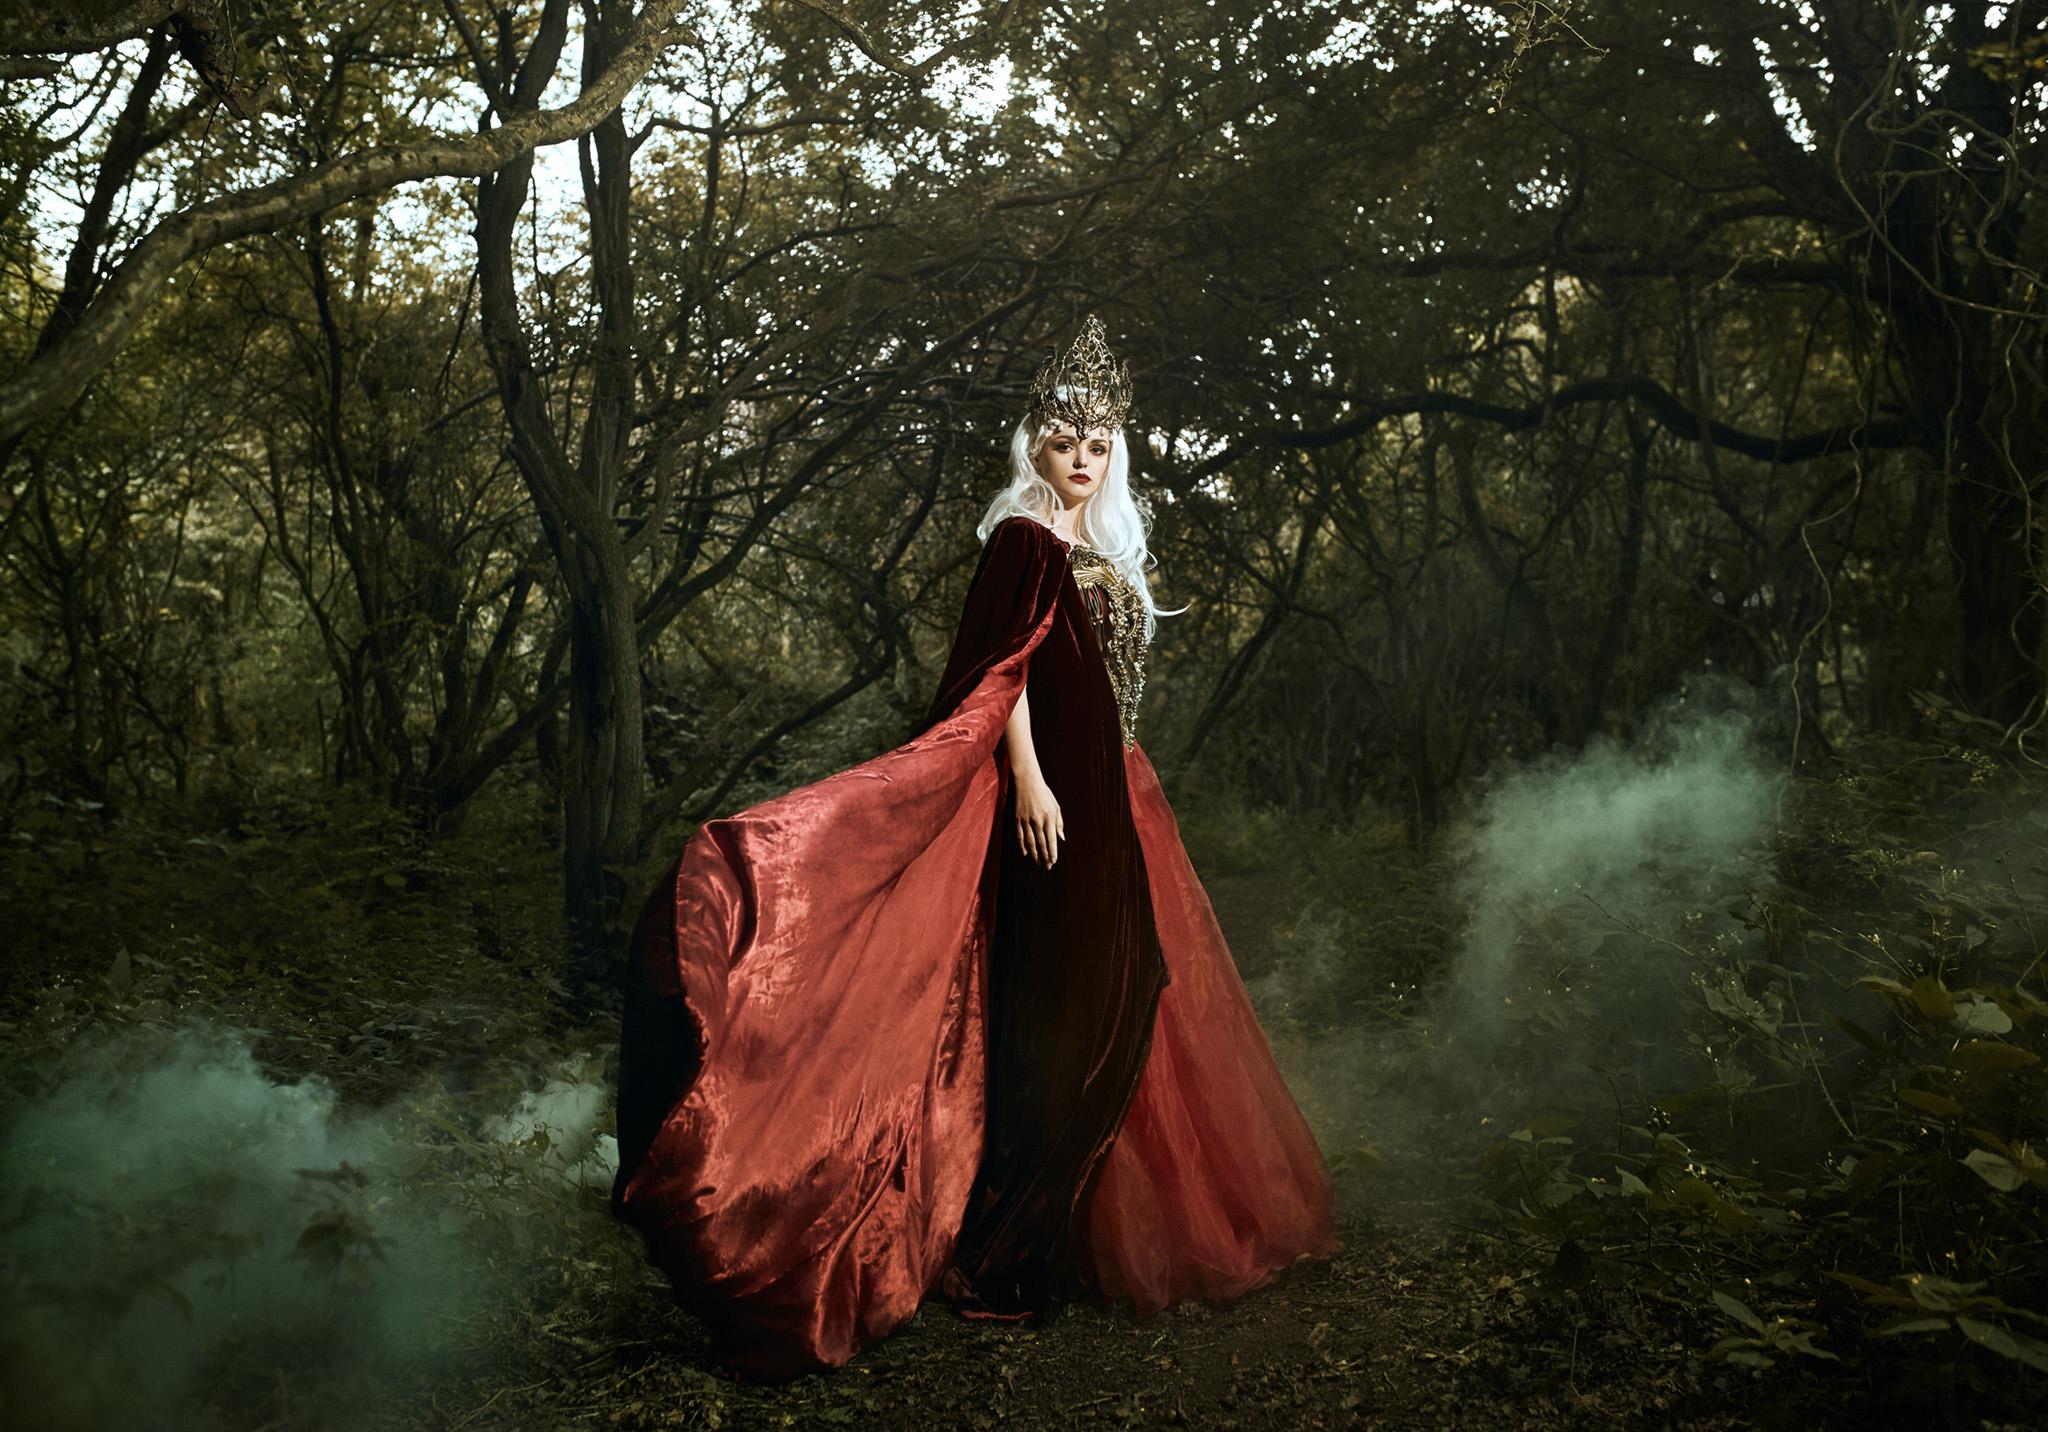 Bella_Kotak_Profoto_Canon_Fairytale_Fantasy_Photography_Portrait_Portraiture_Flowers_FLoral_Queen_Princess_Disney_Fashion_Editorial_A1_Lighting_Pink_Hair_Magical_Ethereal_Solstice_Retouch_6.jpg